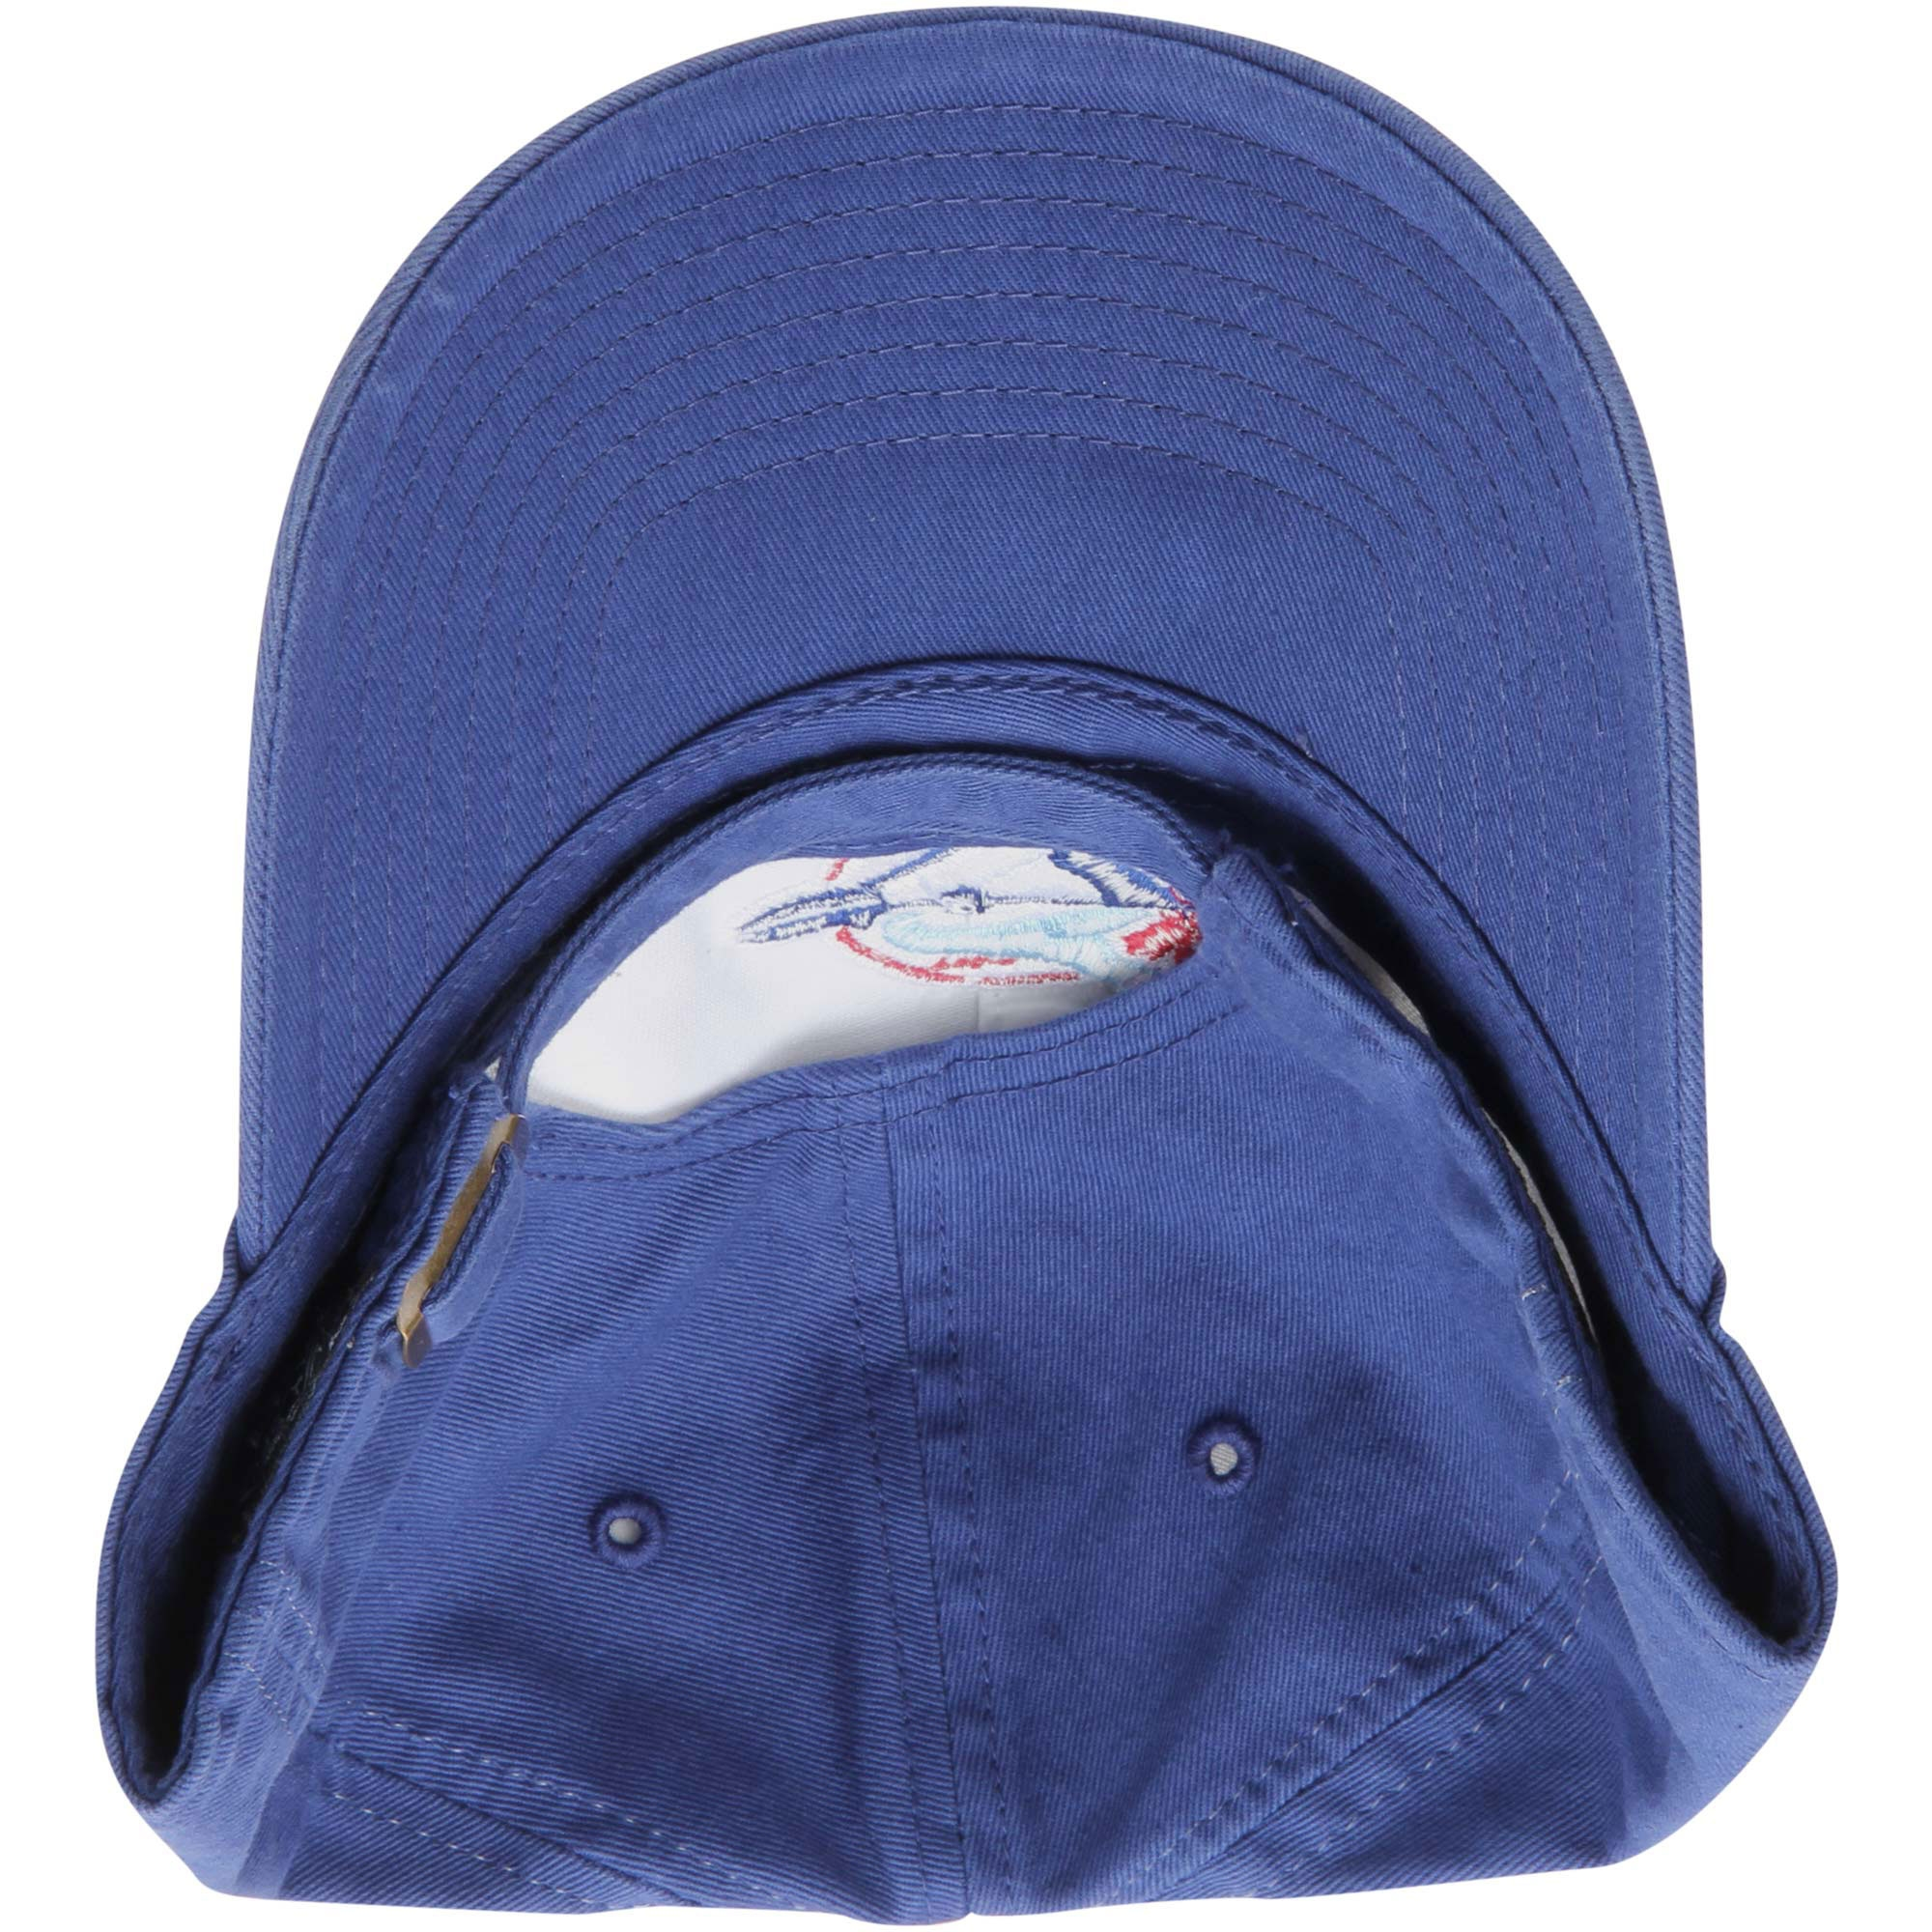 56135ea763980 Toronto Blue Jays  47 Brand Cooperstown Collection Basic Logo Cleanup  Adjustable Hat - Royal Blue - OSFA - Walmart.com